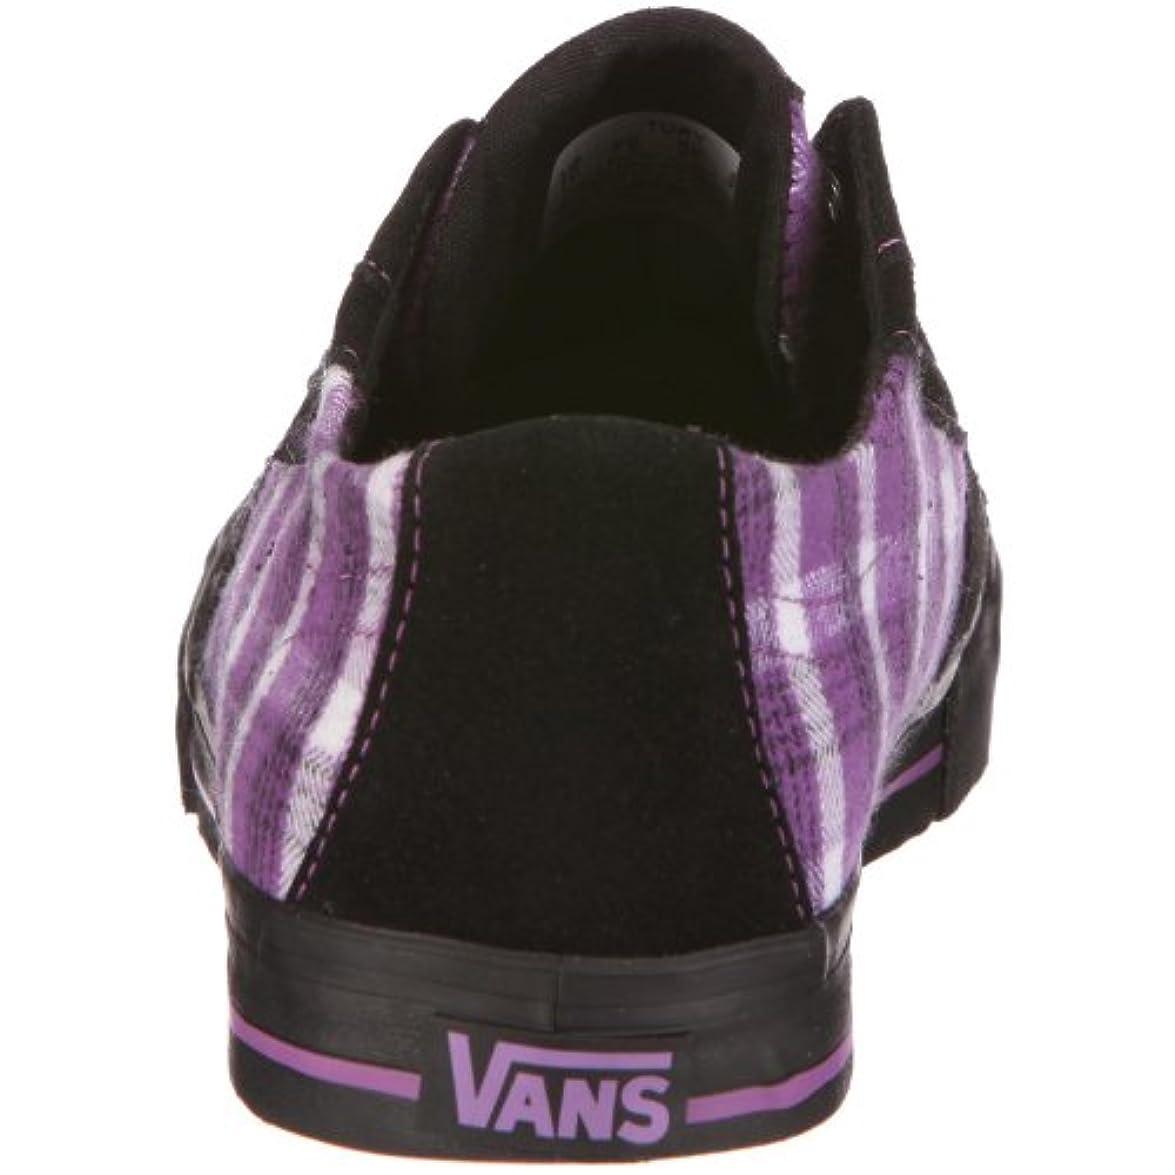 Vans - Sneakers Donna Violet 40 Eu